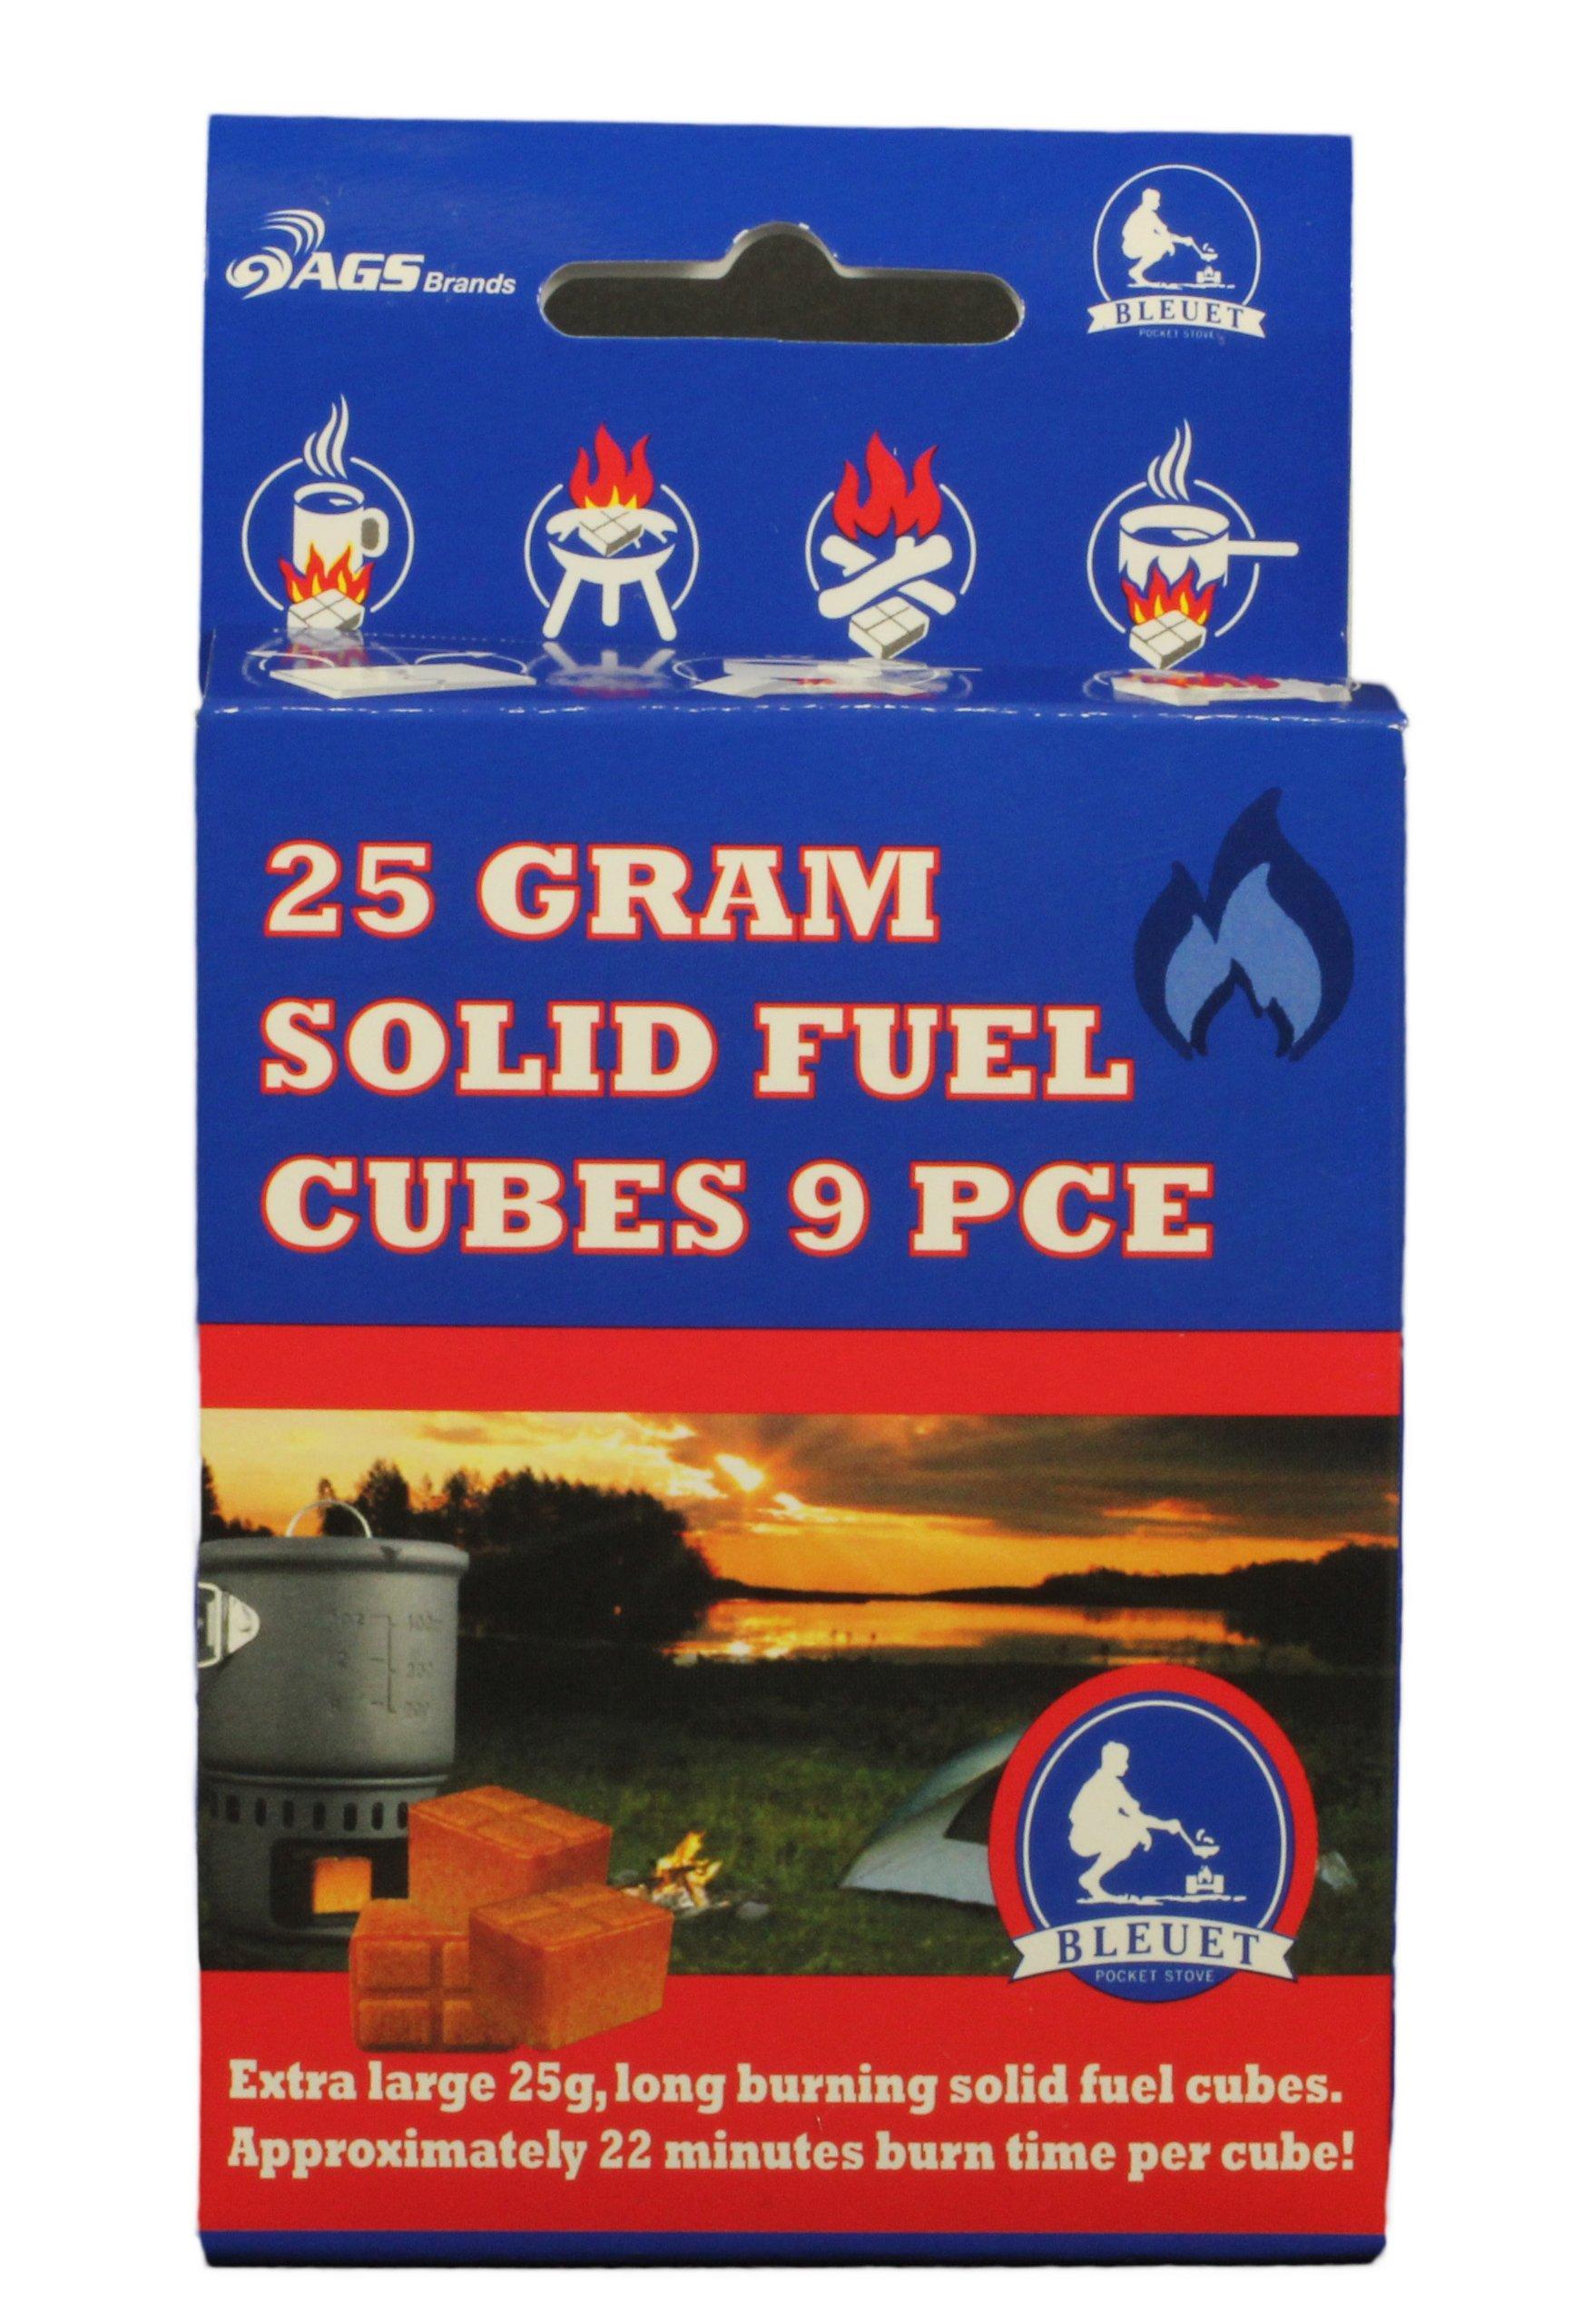 Bleuet Brand Solid Fuel Cubes, 25gm by Bleuet Brand